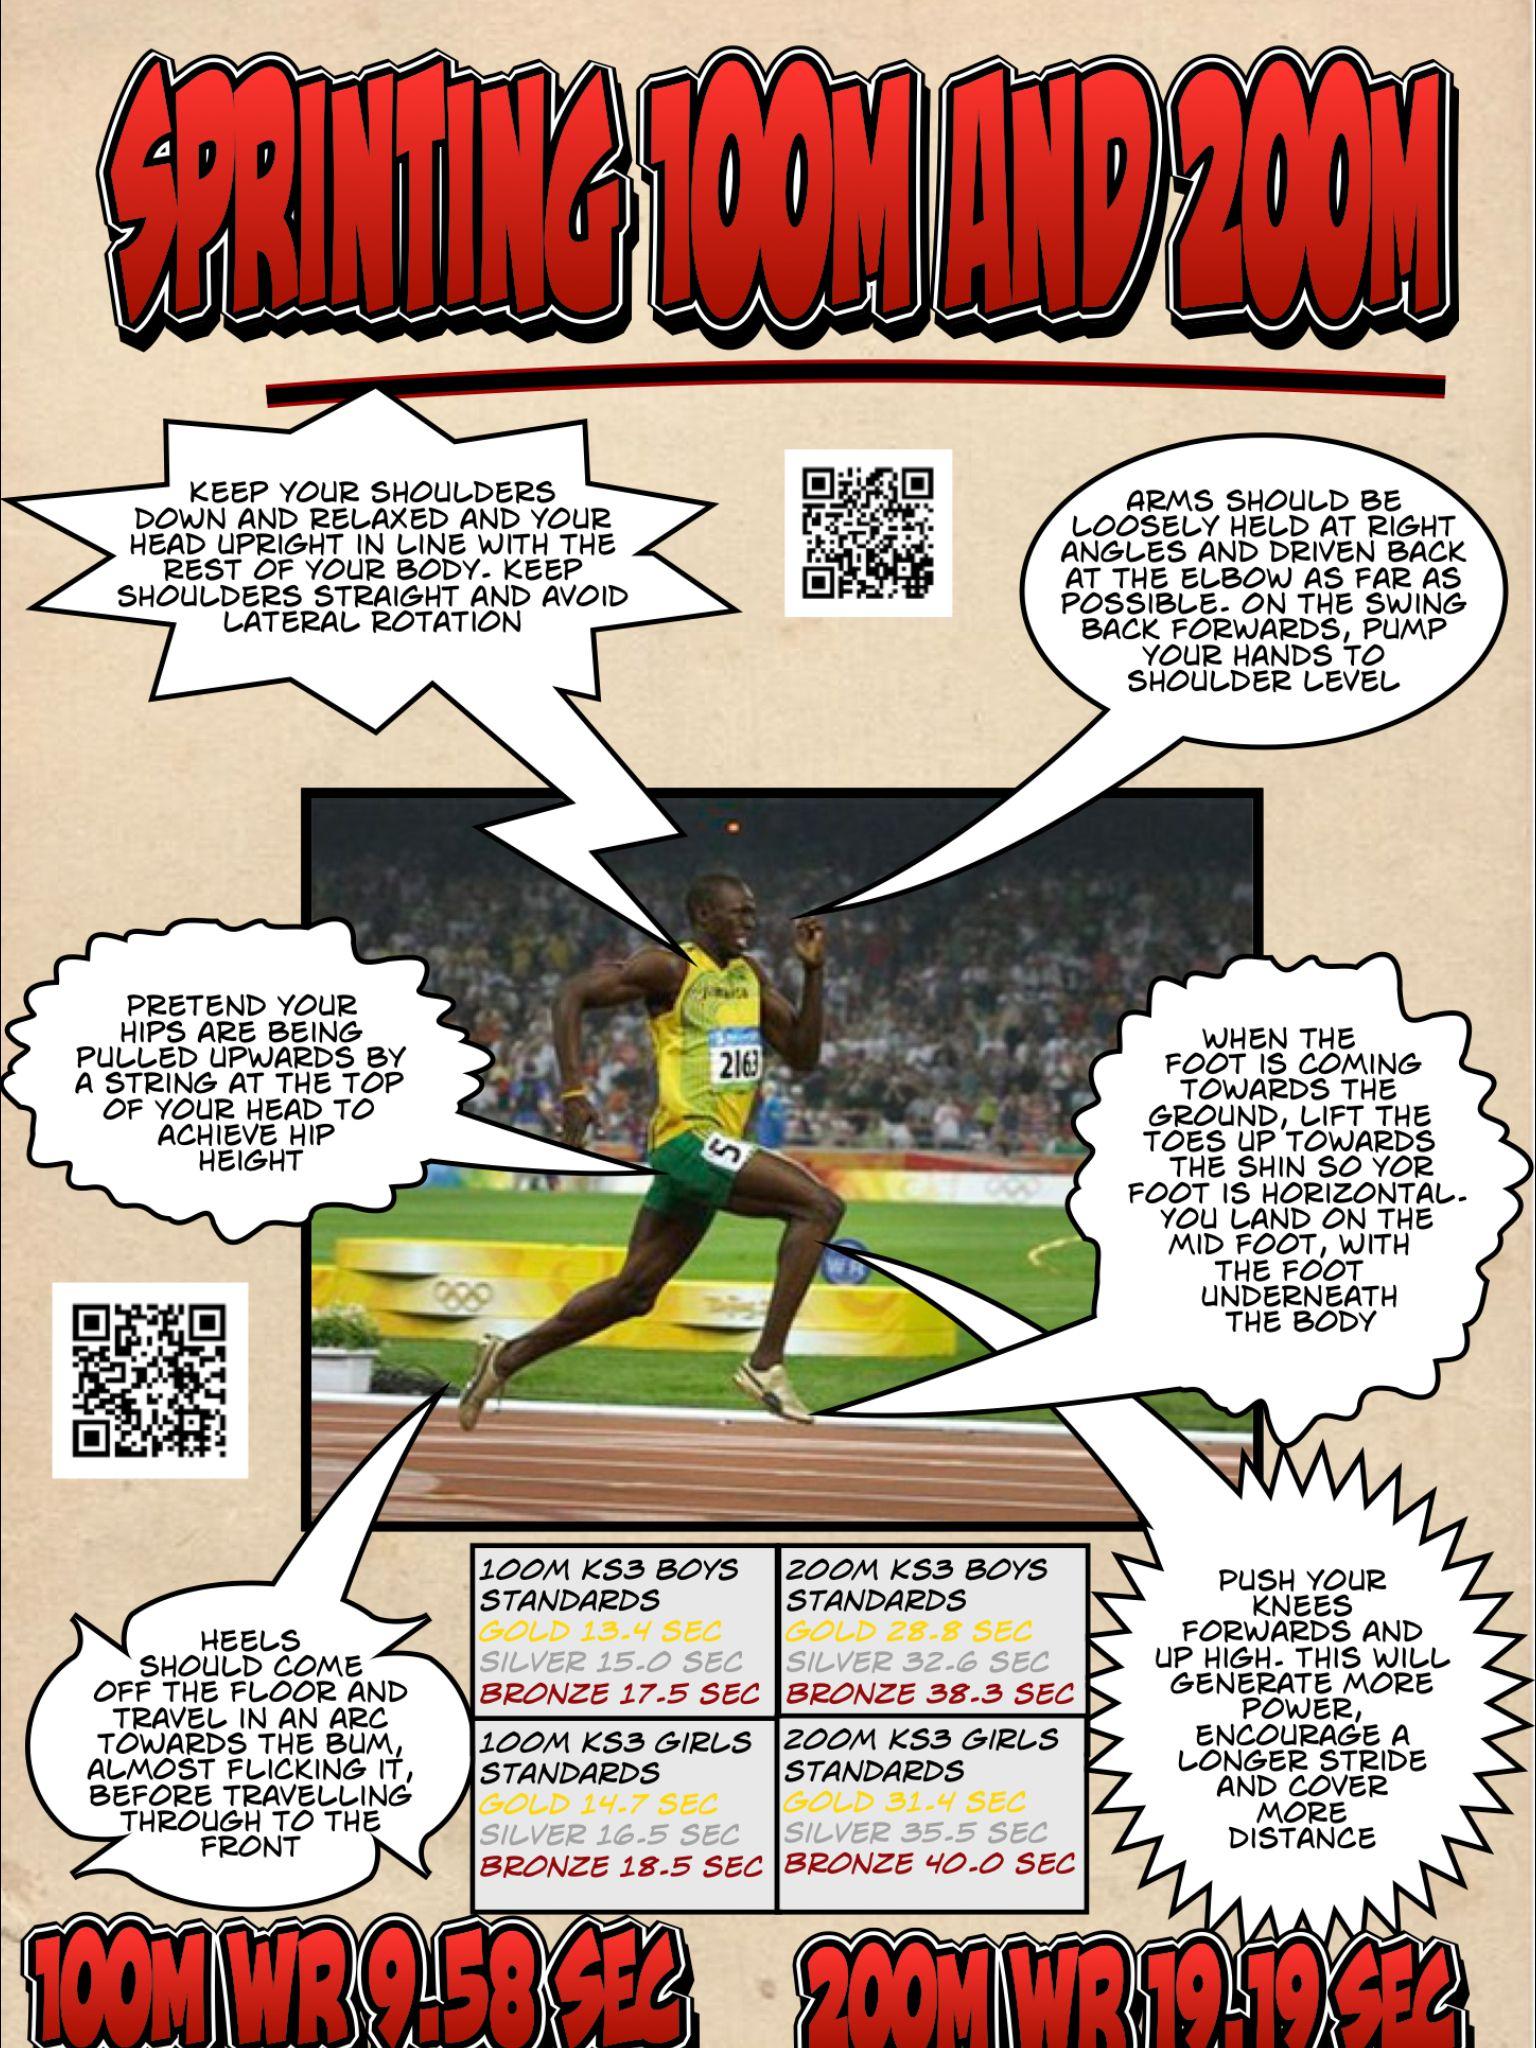 Sprinting Resource